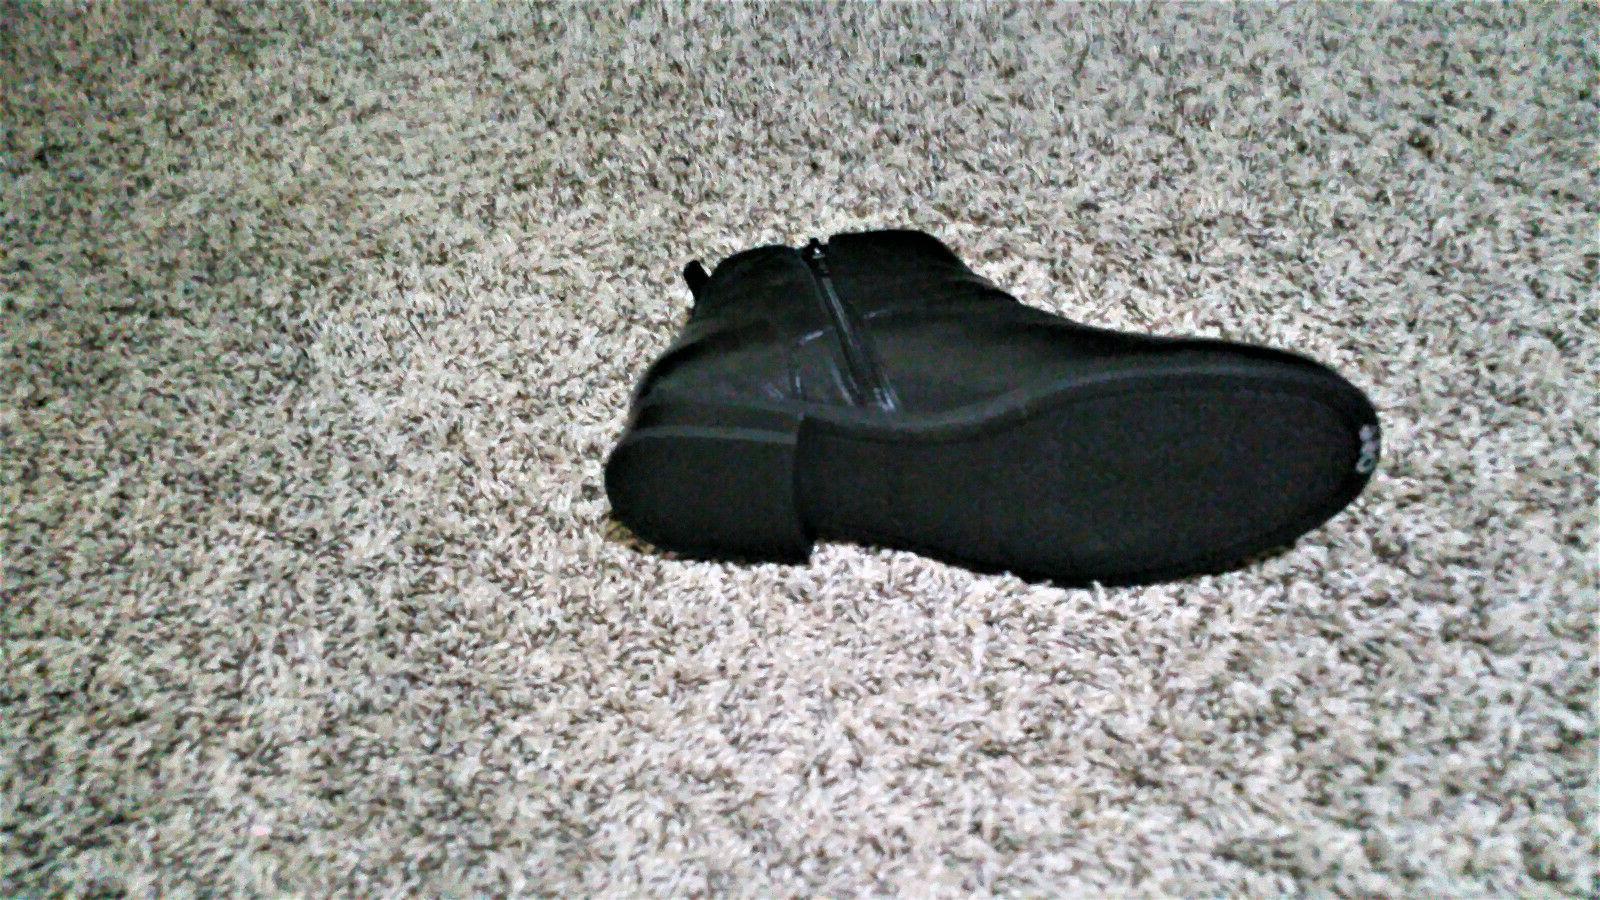 NWOB- VIONIC Logan Ankle 8.5M Black